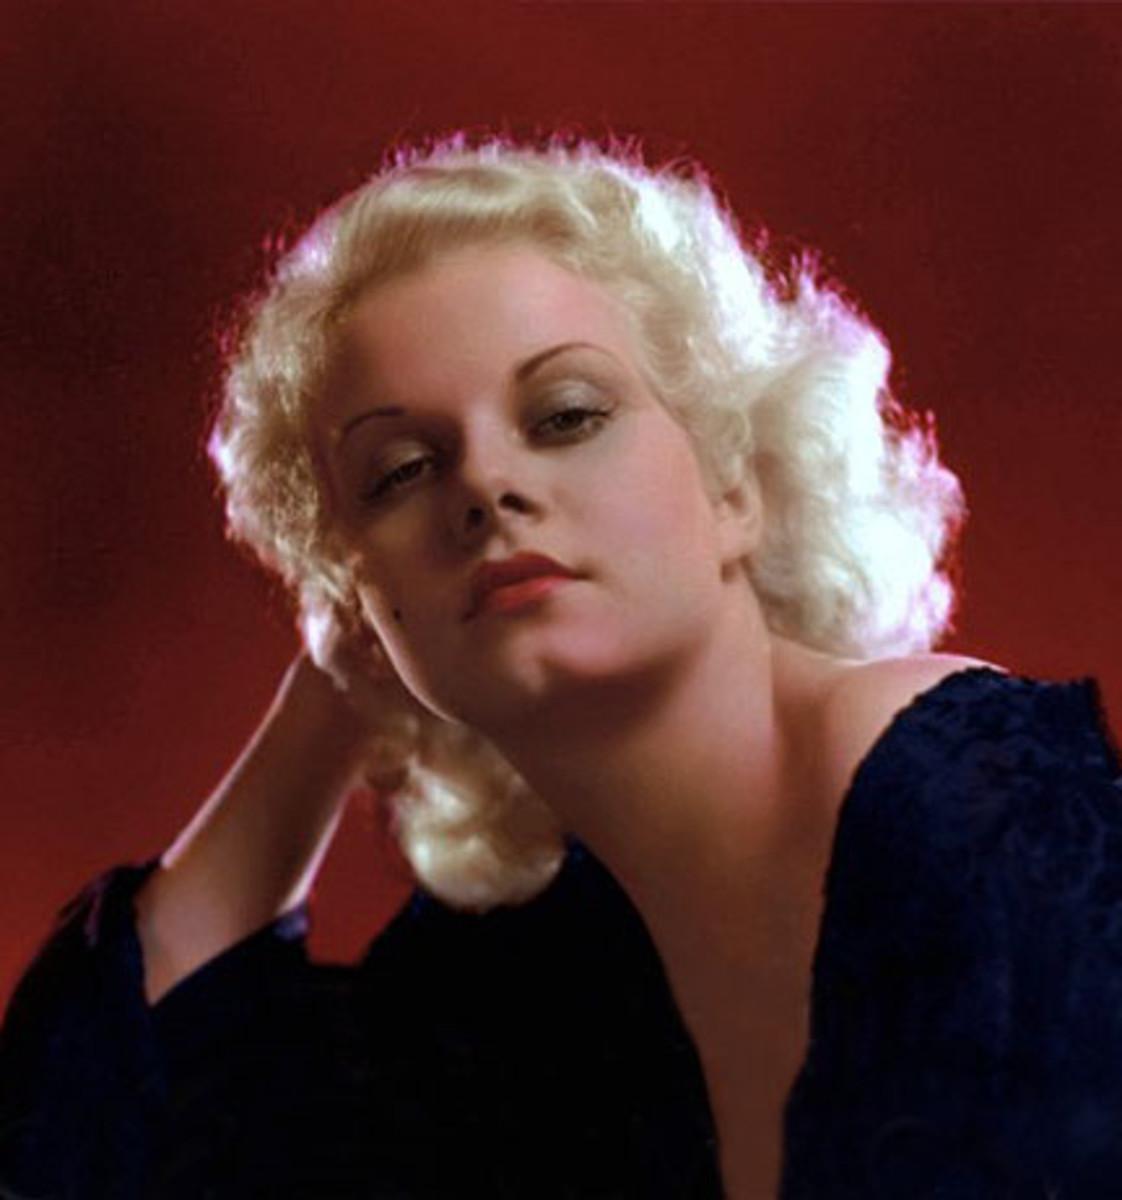 Jean Harlow, 30s Goddess, Paul Bern